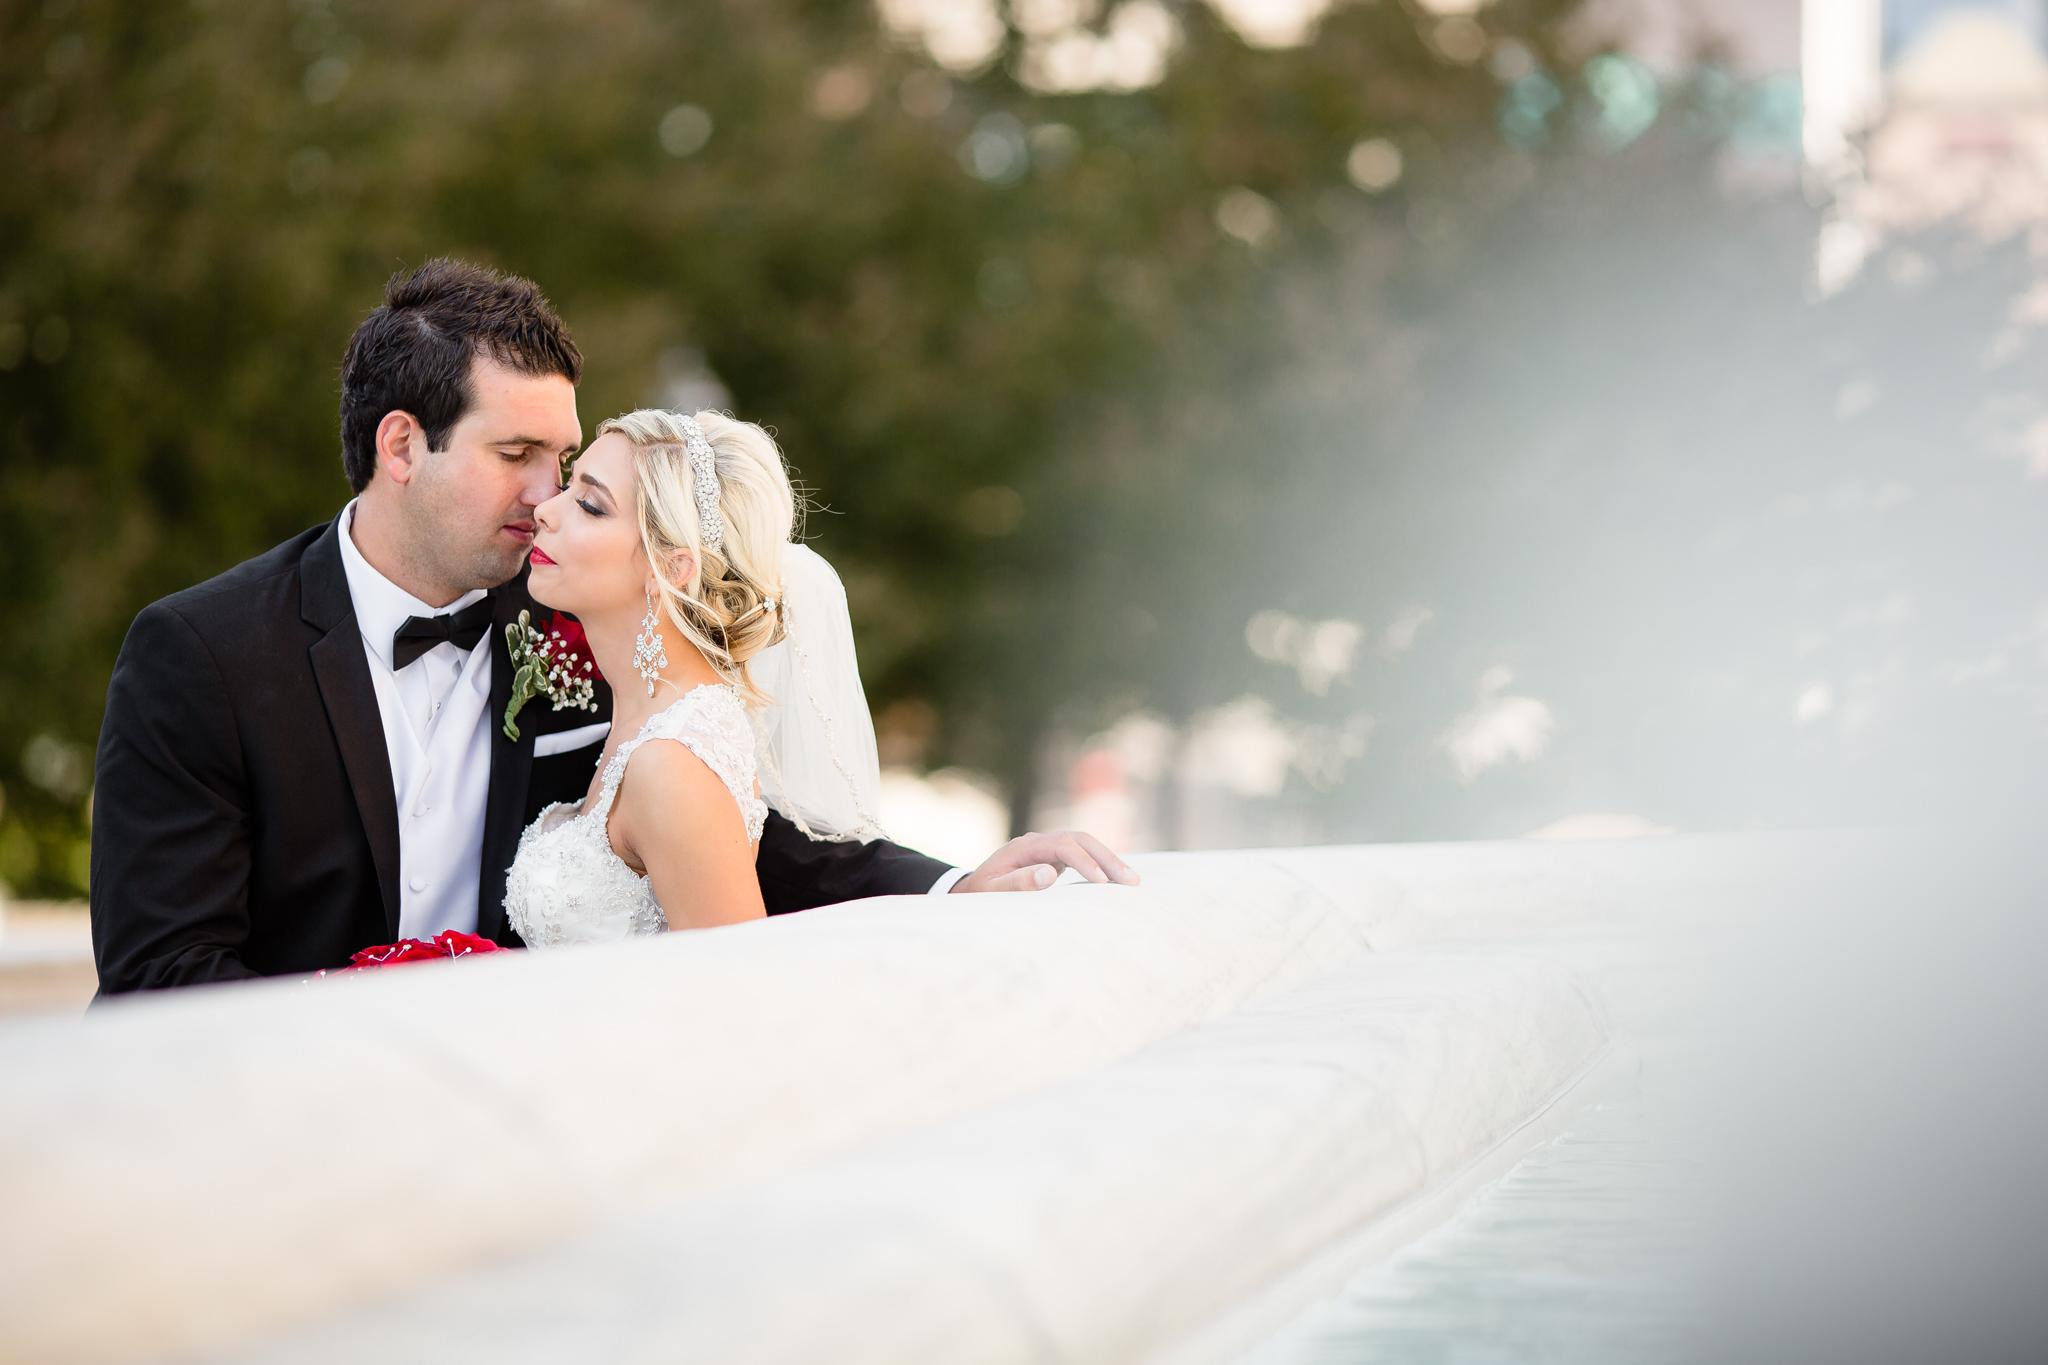 Statler-City-Buffalo-wedding-photographer- 0446.jpg